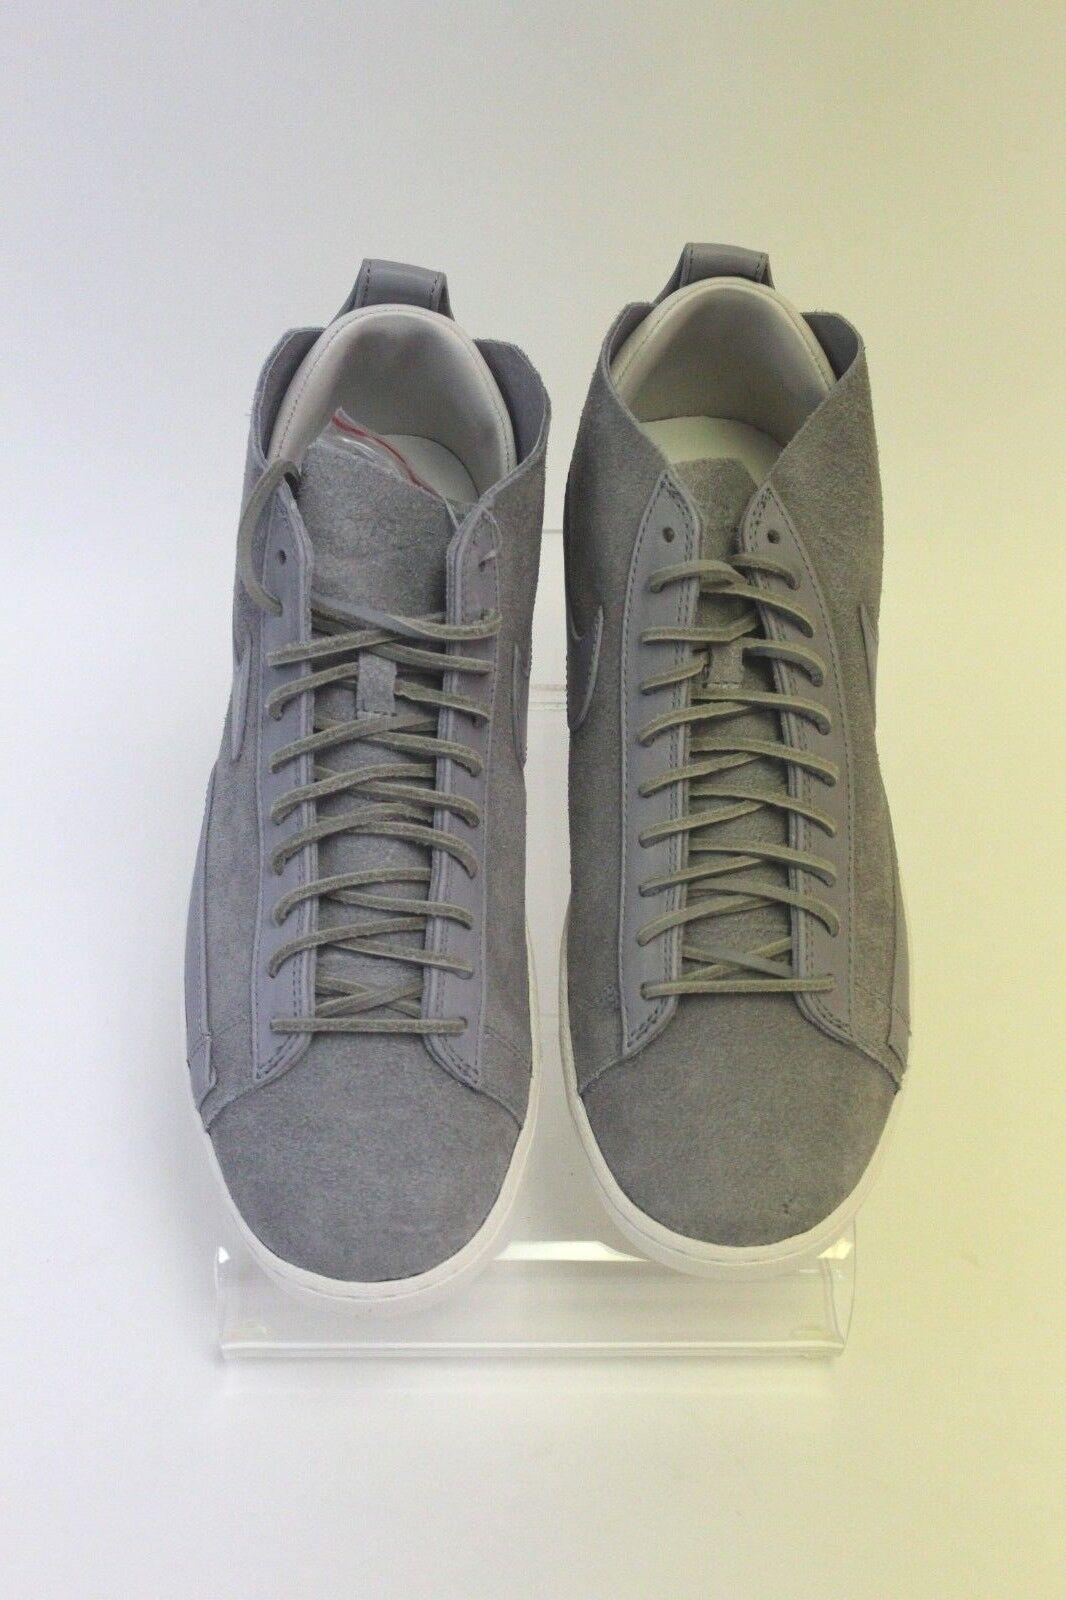 1a997c2575ec Nike Men s Blazer Chukka Chukka Chukka CS TC Size 12 0a25e4 - work ...